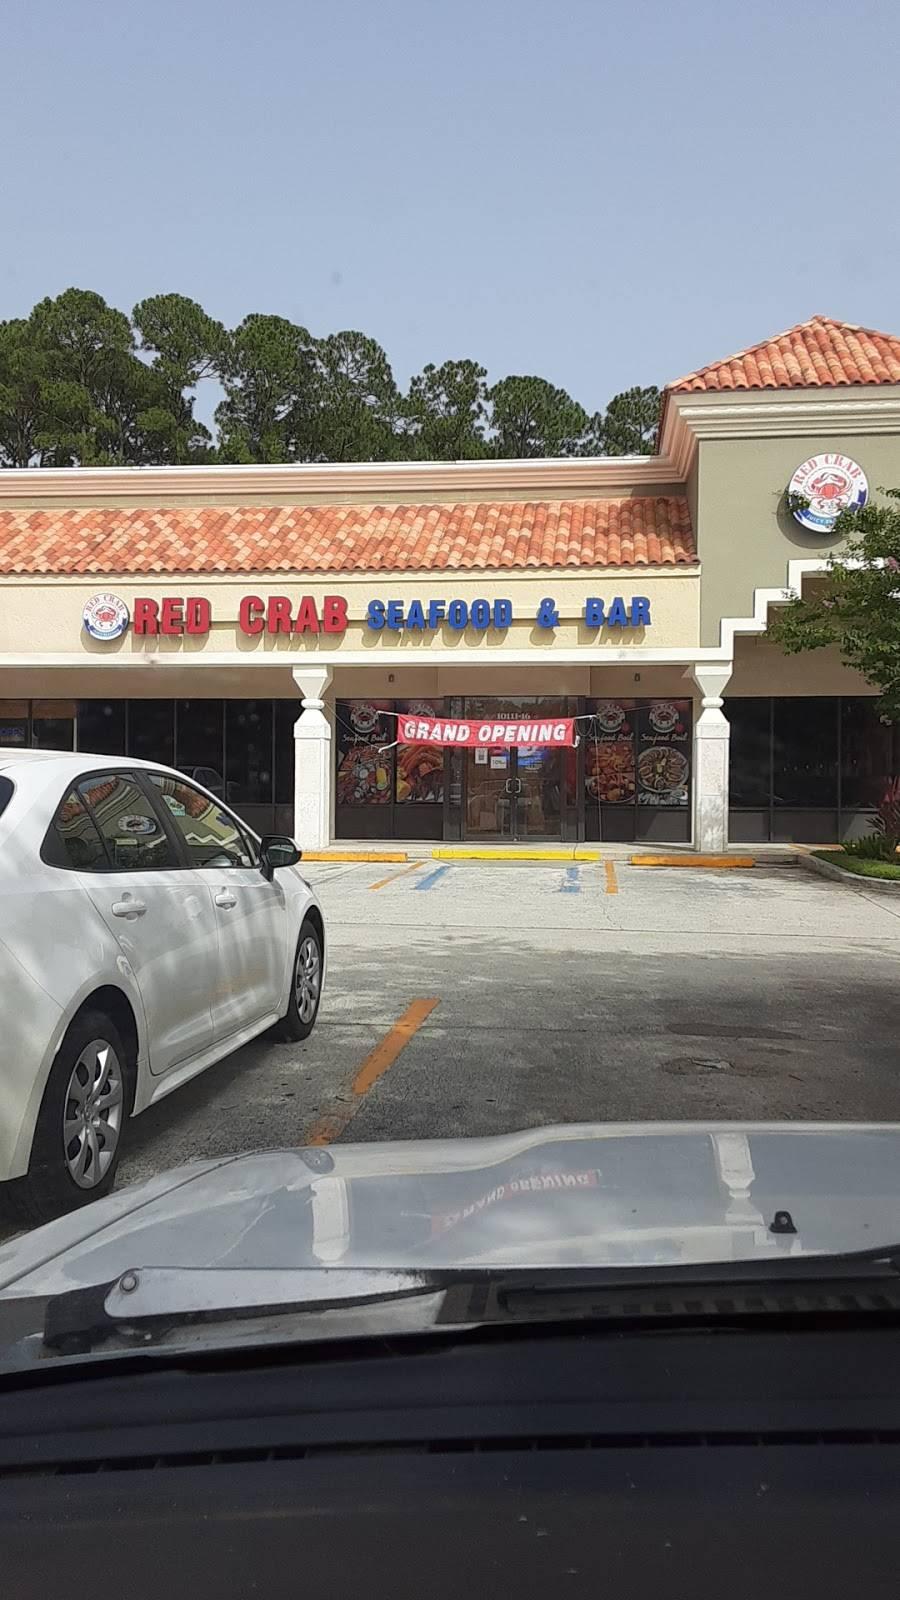 Red Crab - Juicy Seafood | restaurant | 10111 San Jose Blvd Ste.16, Jacksonville, FL 32257, USA | 9045519930 OR +1 904-551-9930